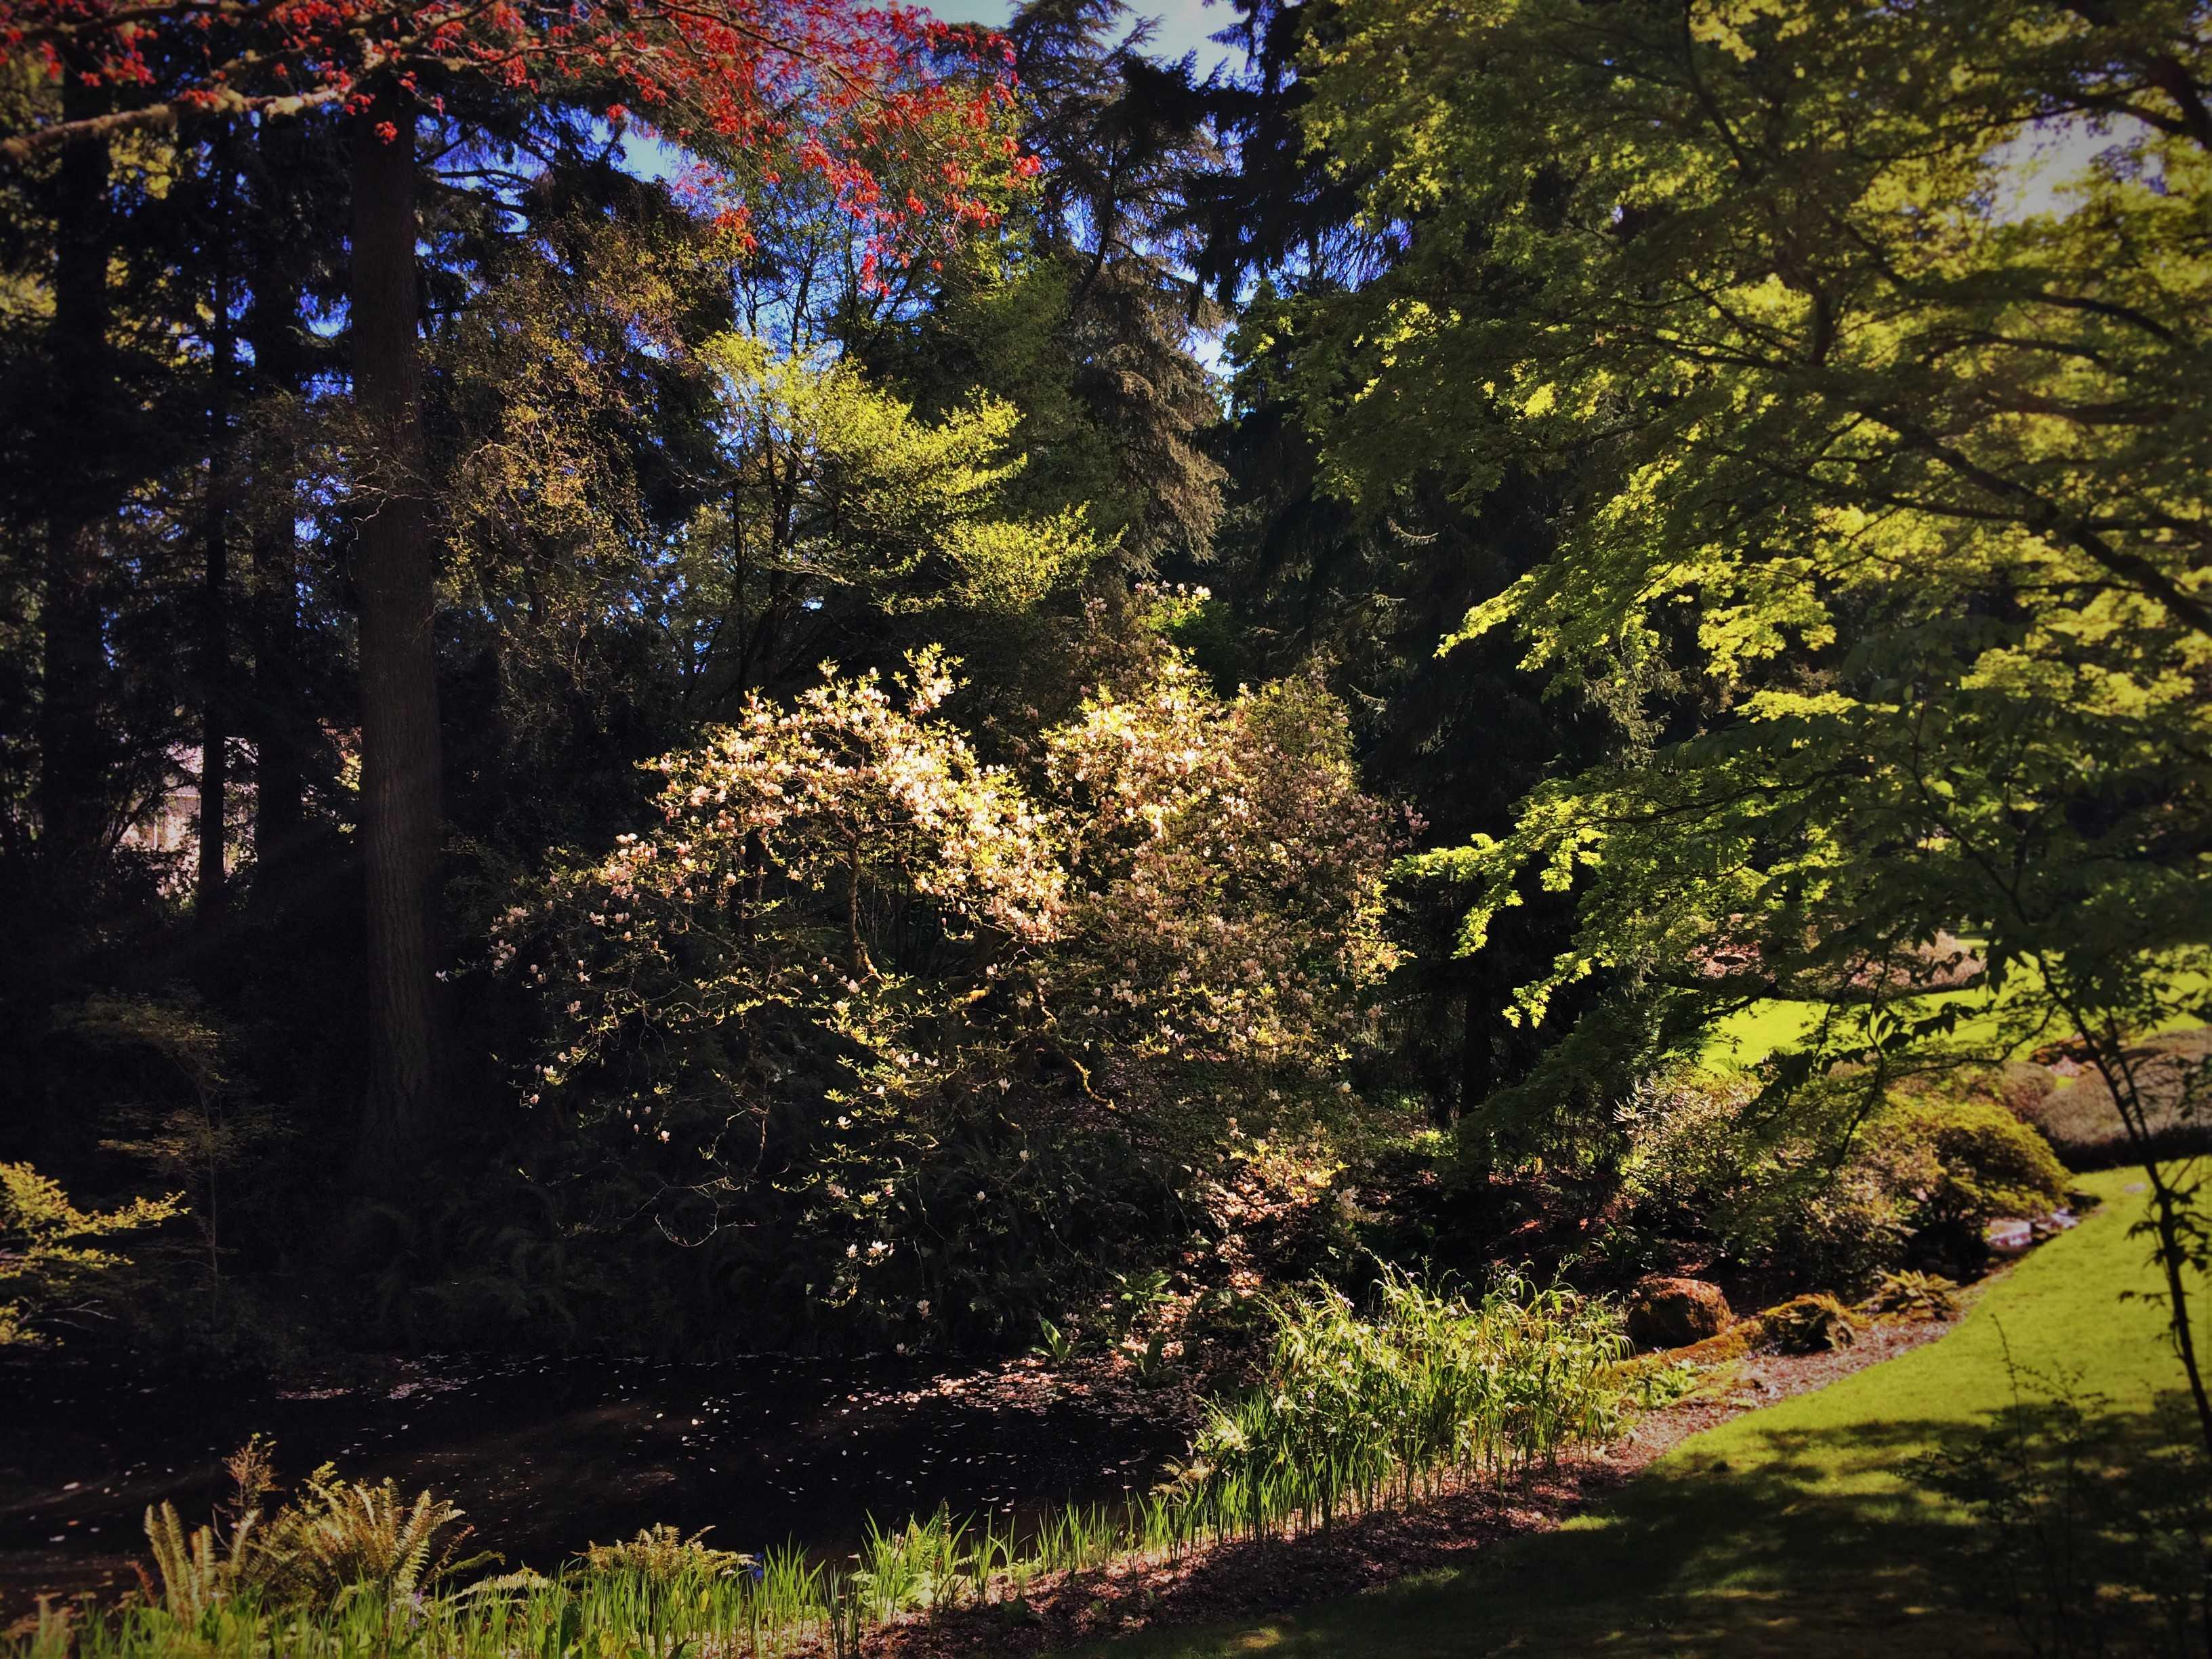 Magnolia Tree in Japanese Garden with Reflections at Bloedel Reserve Bainbridge Island 2